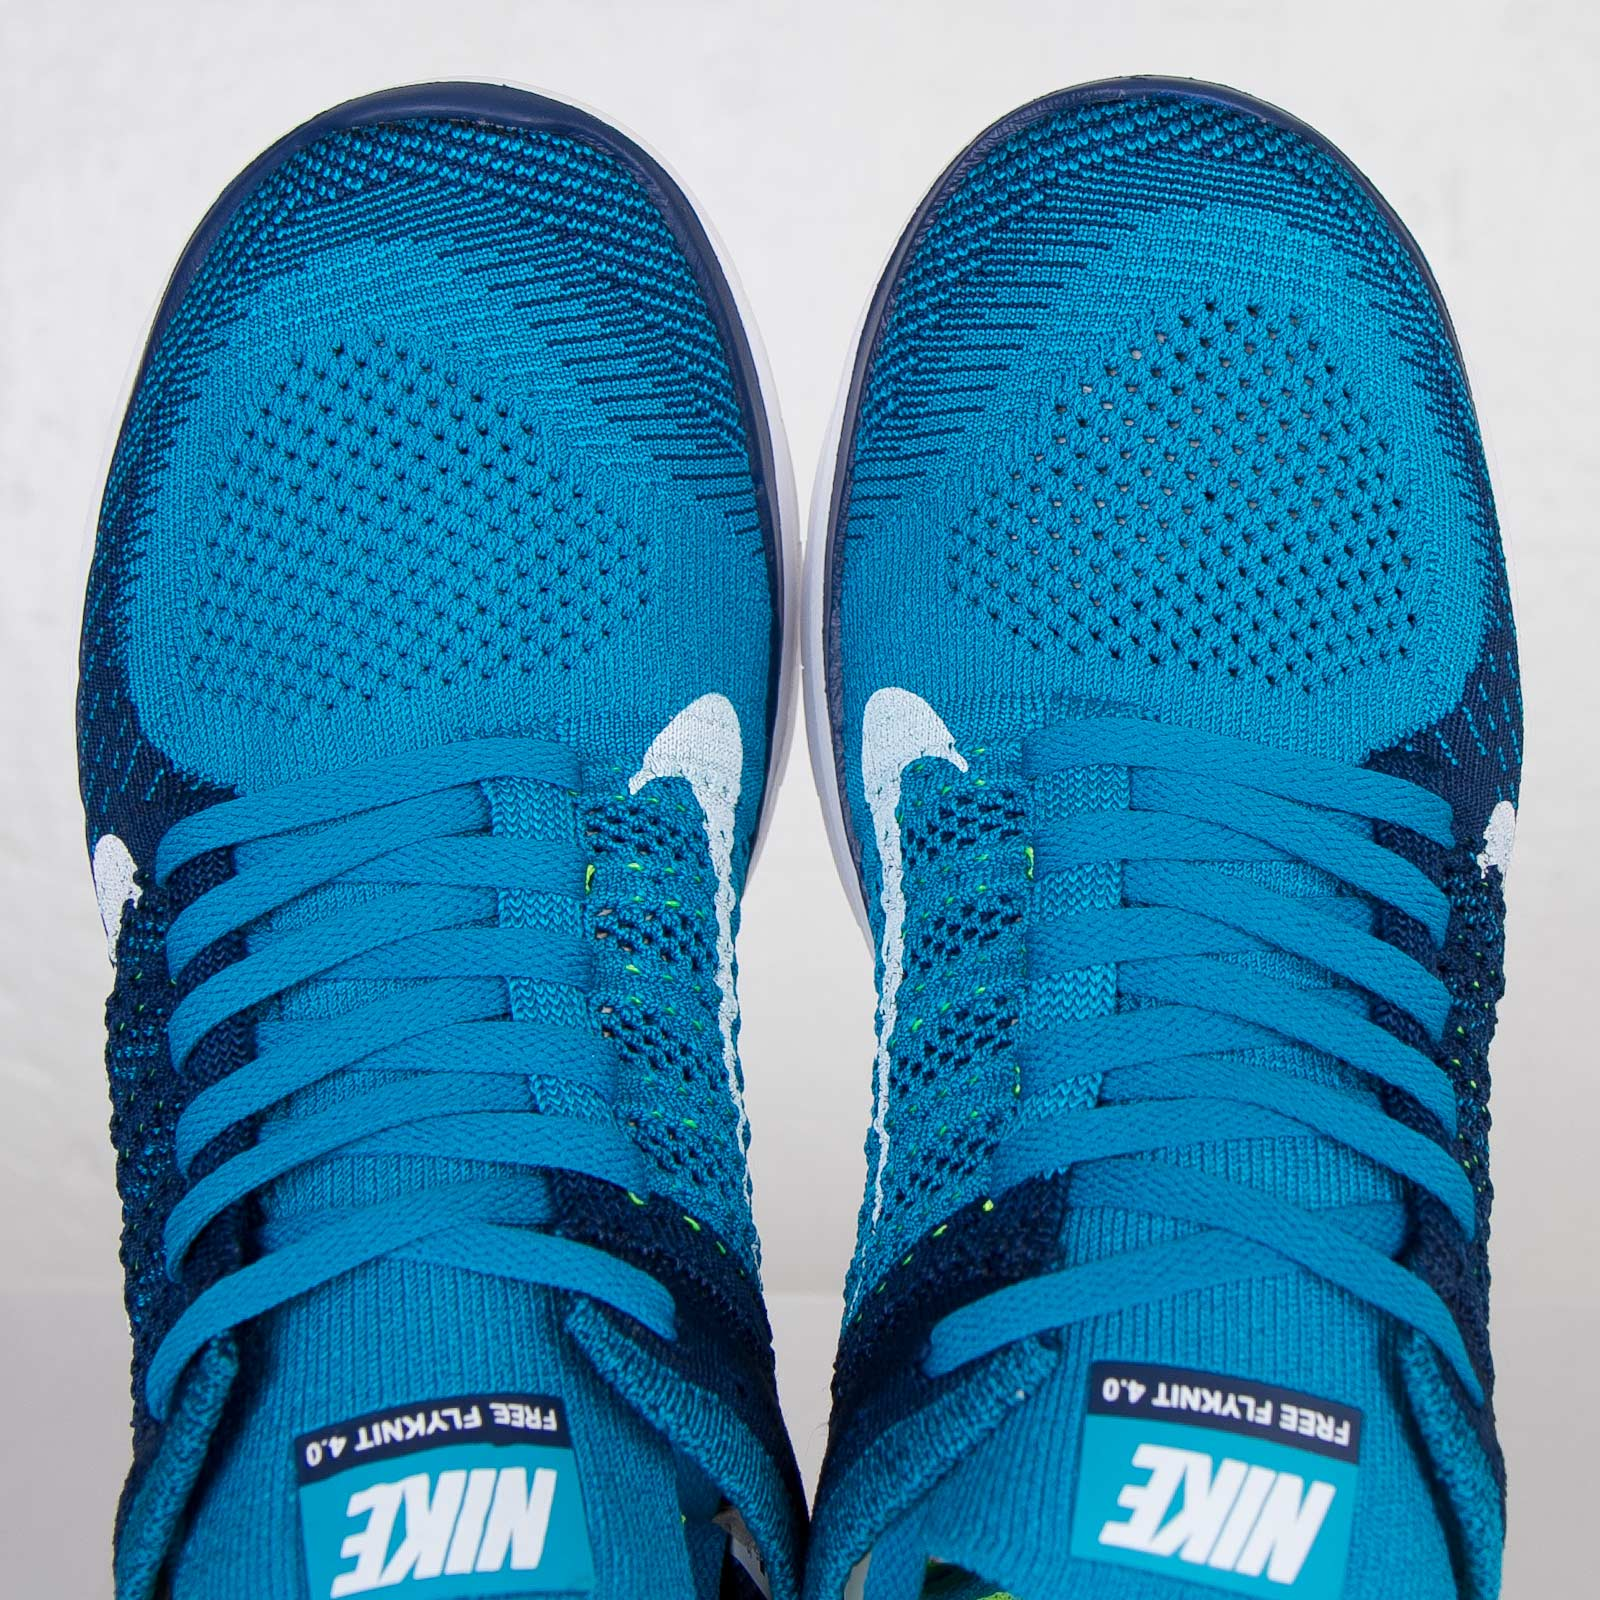 a3b9222f65f Nike Free Flyknit 4.0 - 631053-401 - Sneakersnstuff